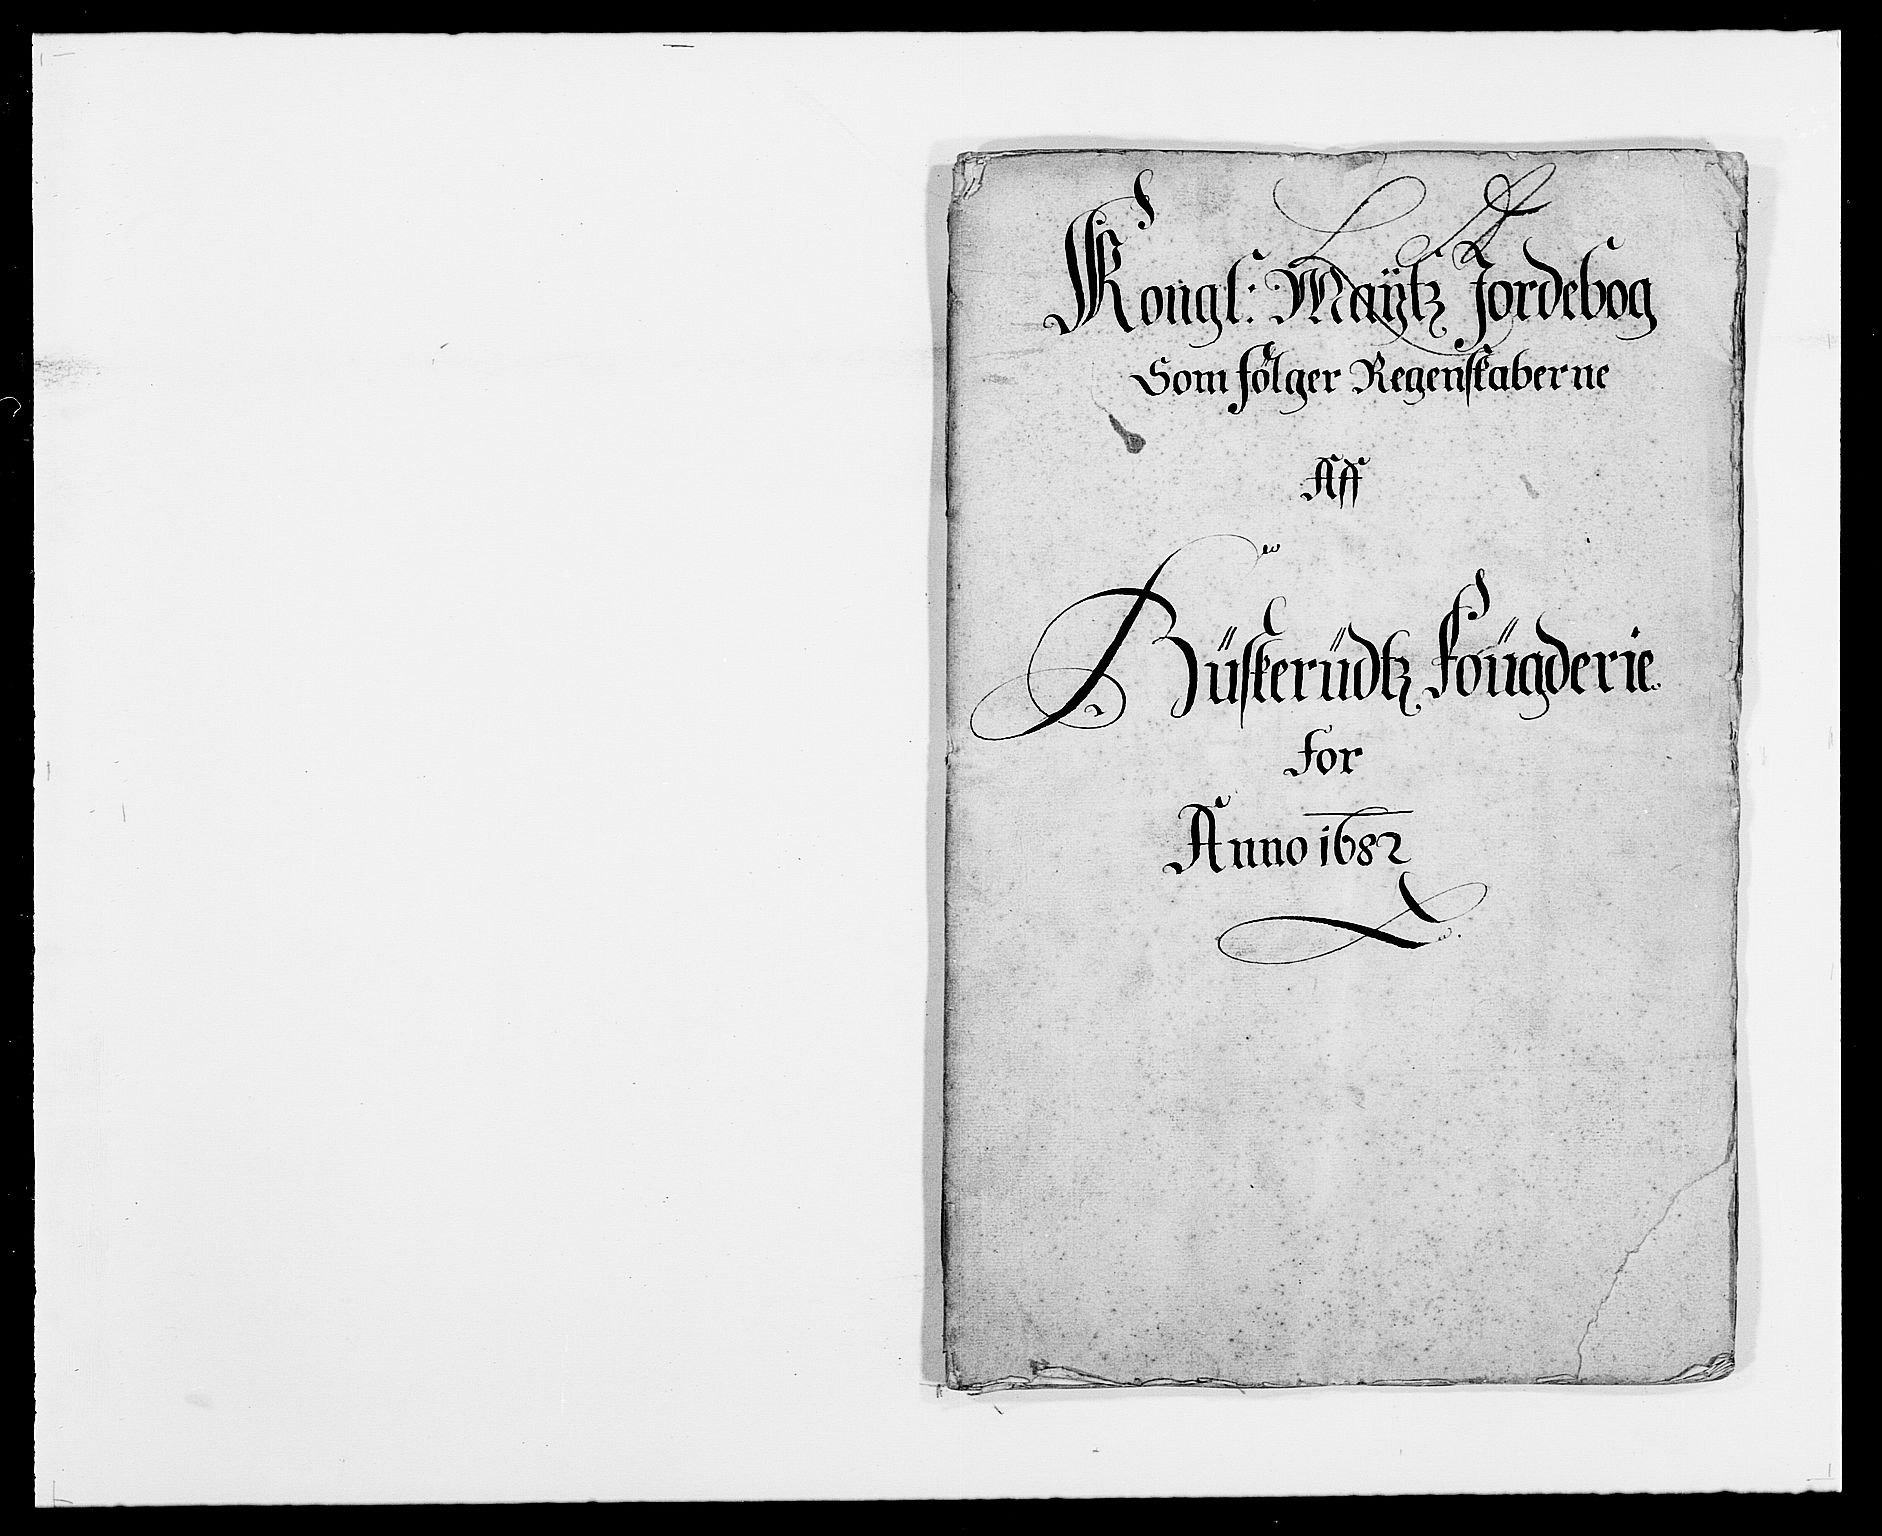 RA, Rentekammeret inntil 1814, Reviderte regnskaper, Fogderegnskap, R25/L1676: Fogderegnskap Buskerud, 1682, s. 1